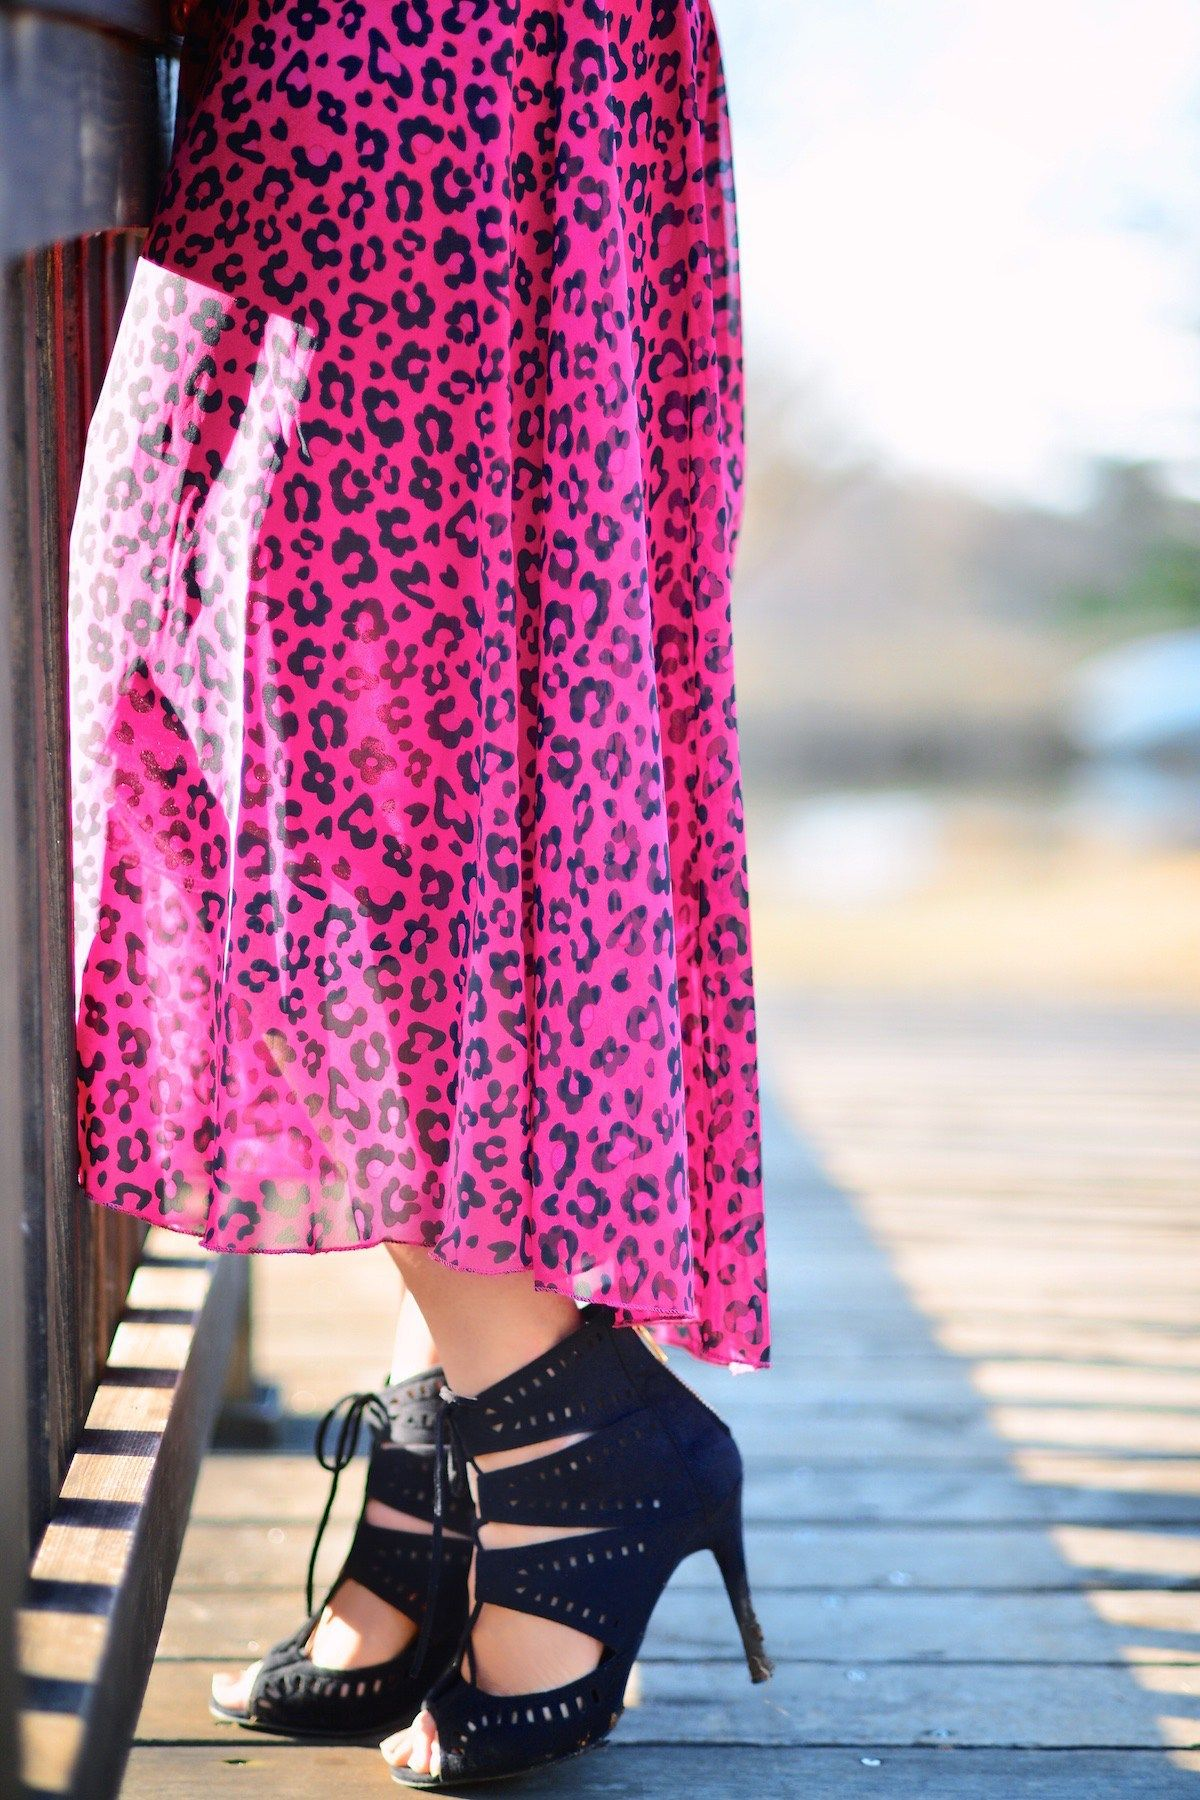 Maxi dress and high heels